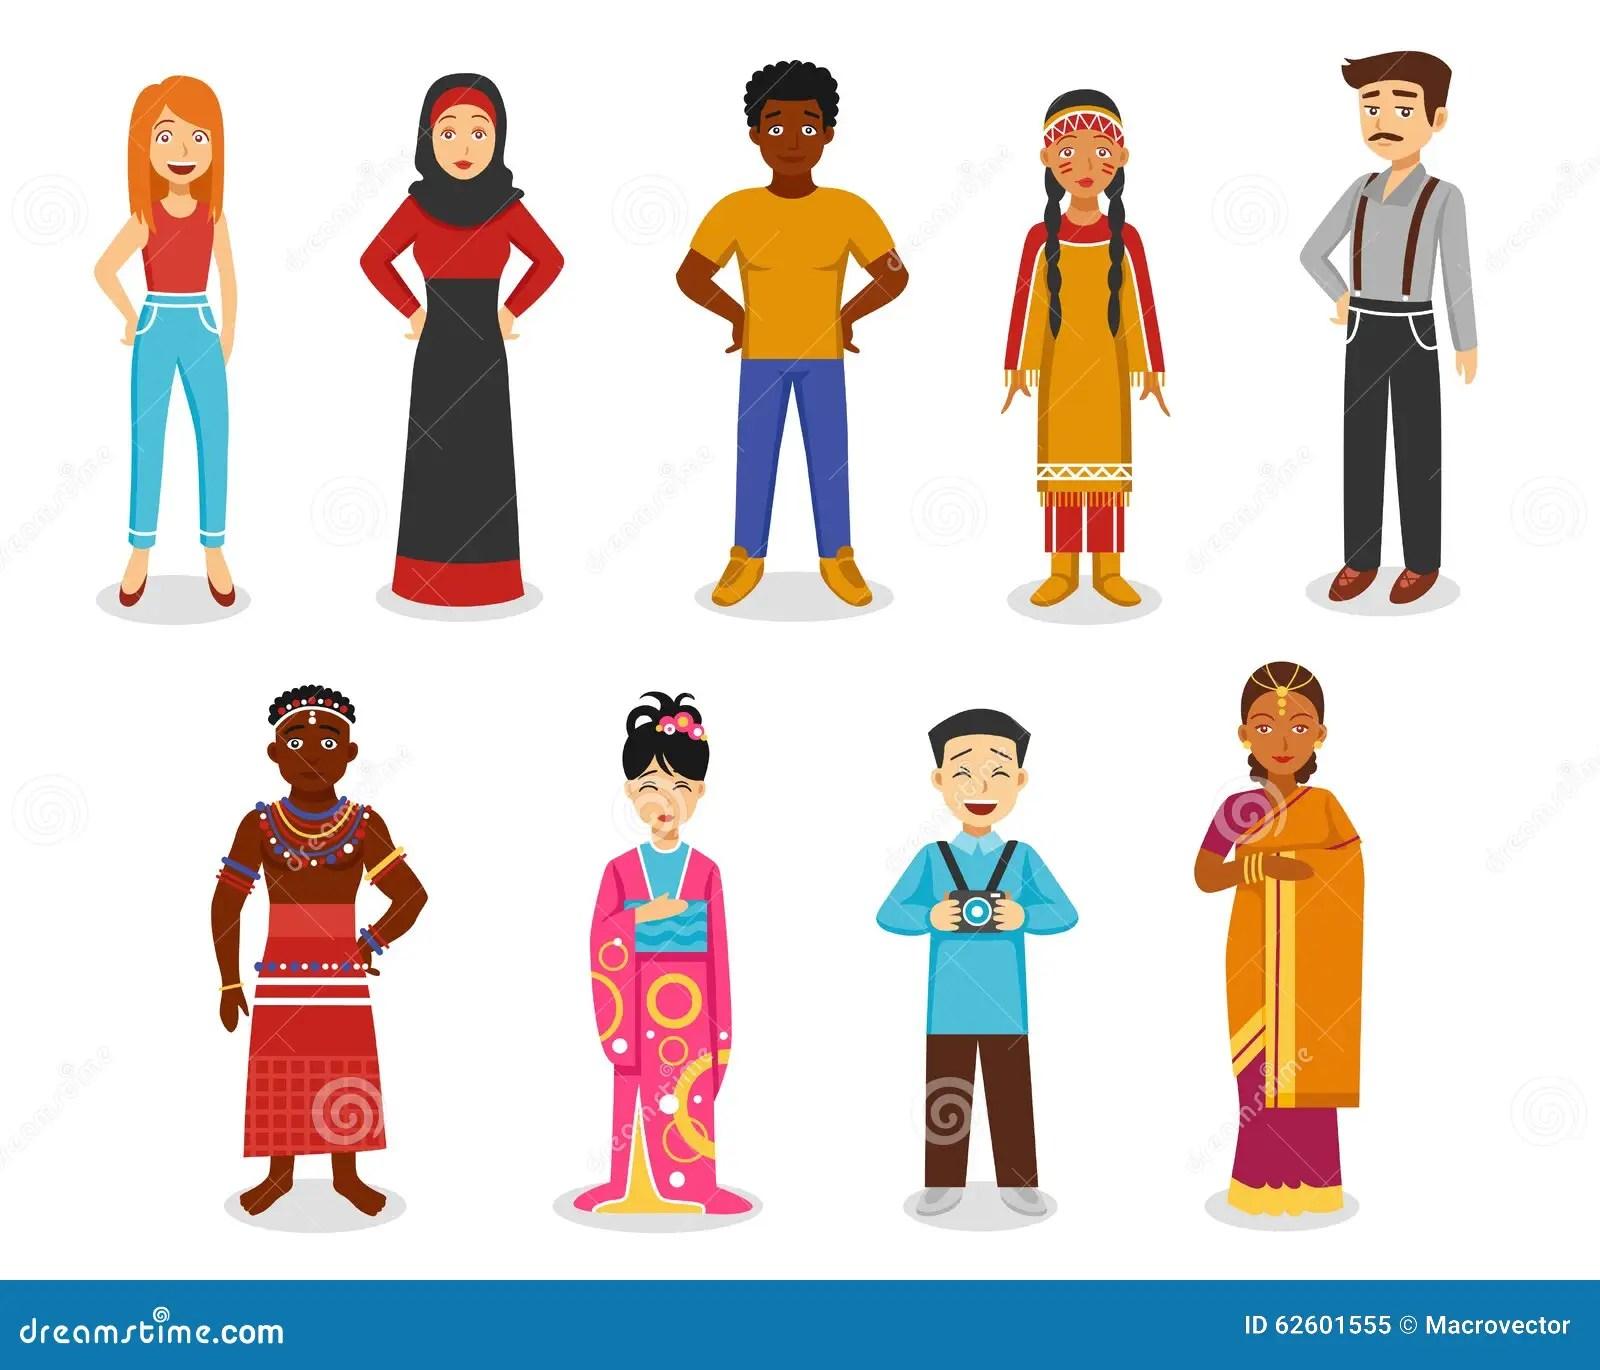 Caucasian People American Indian Cartoon